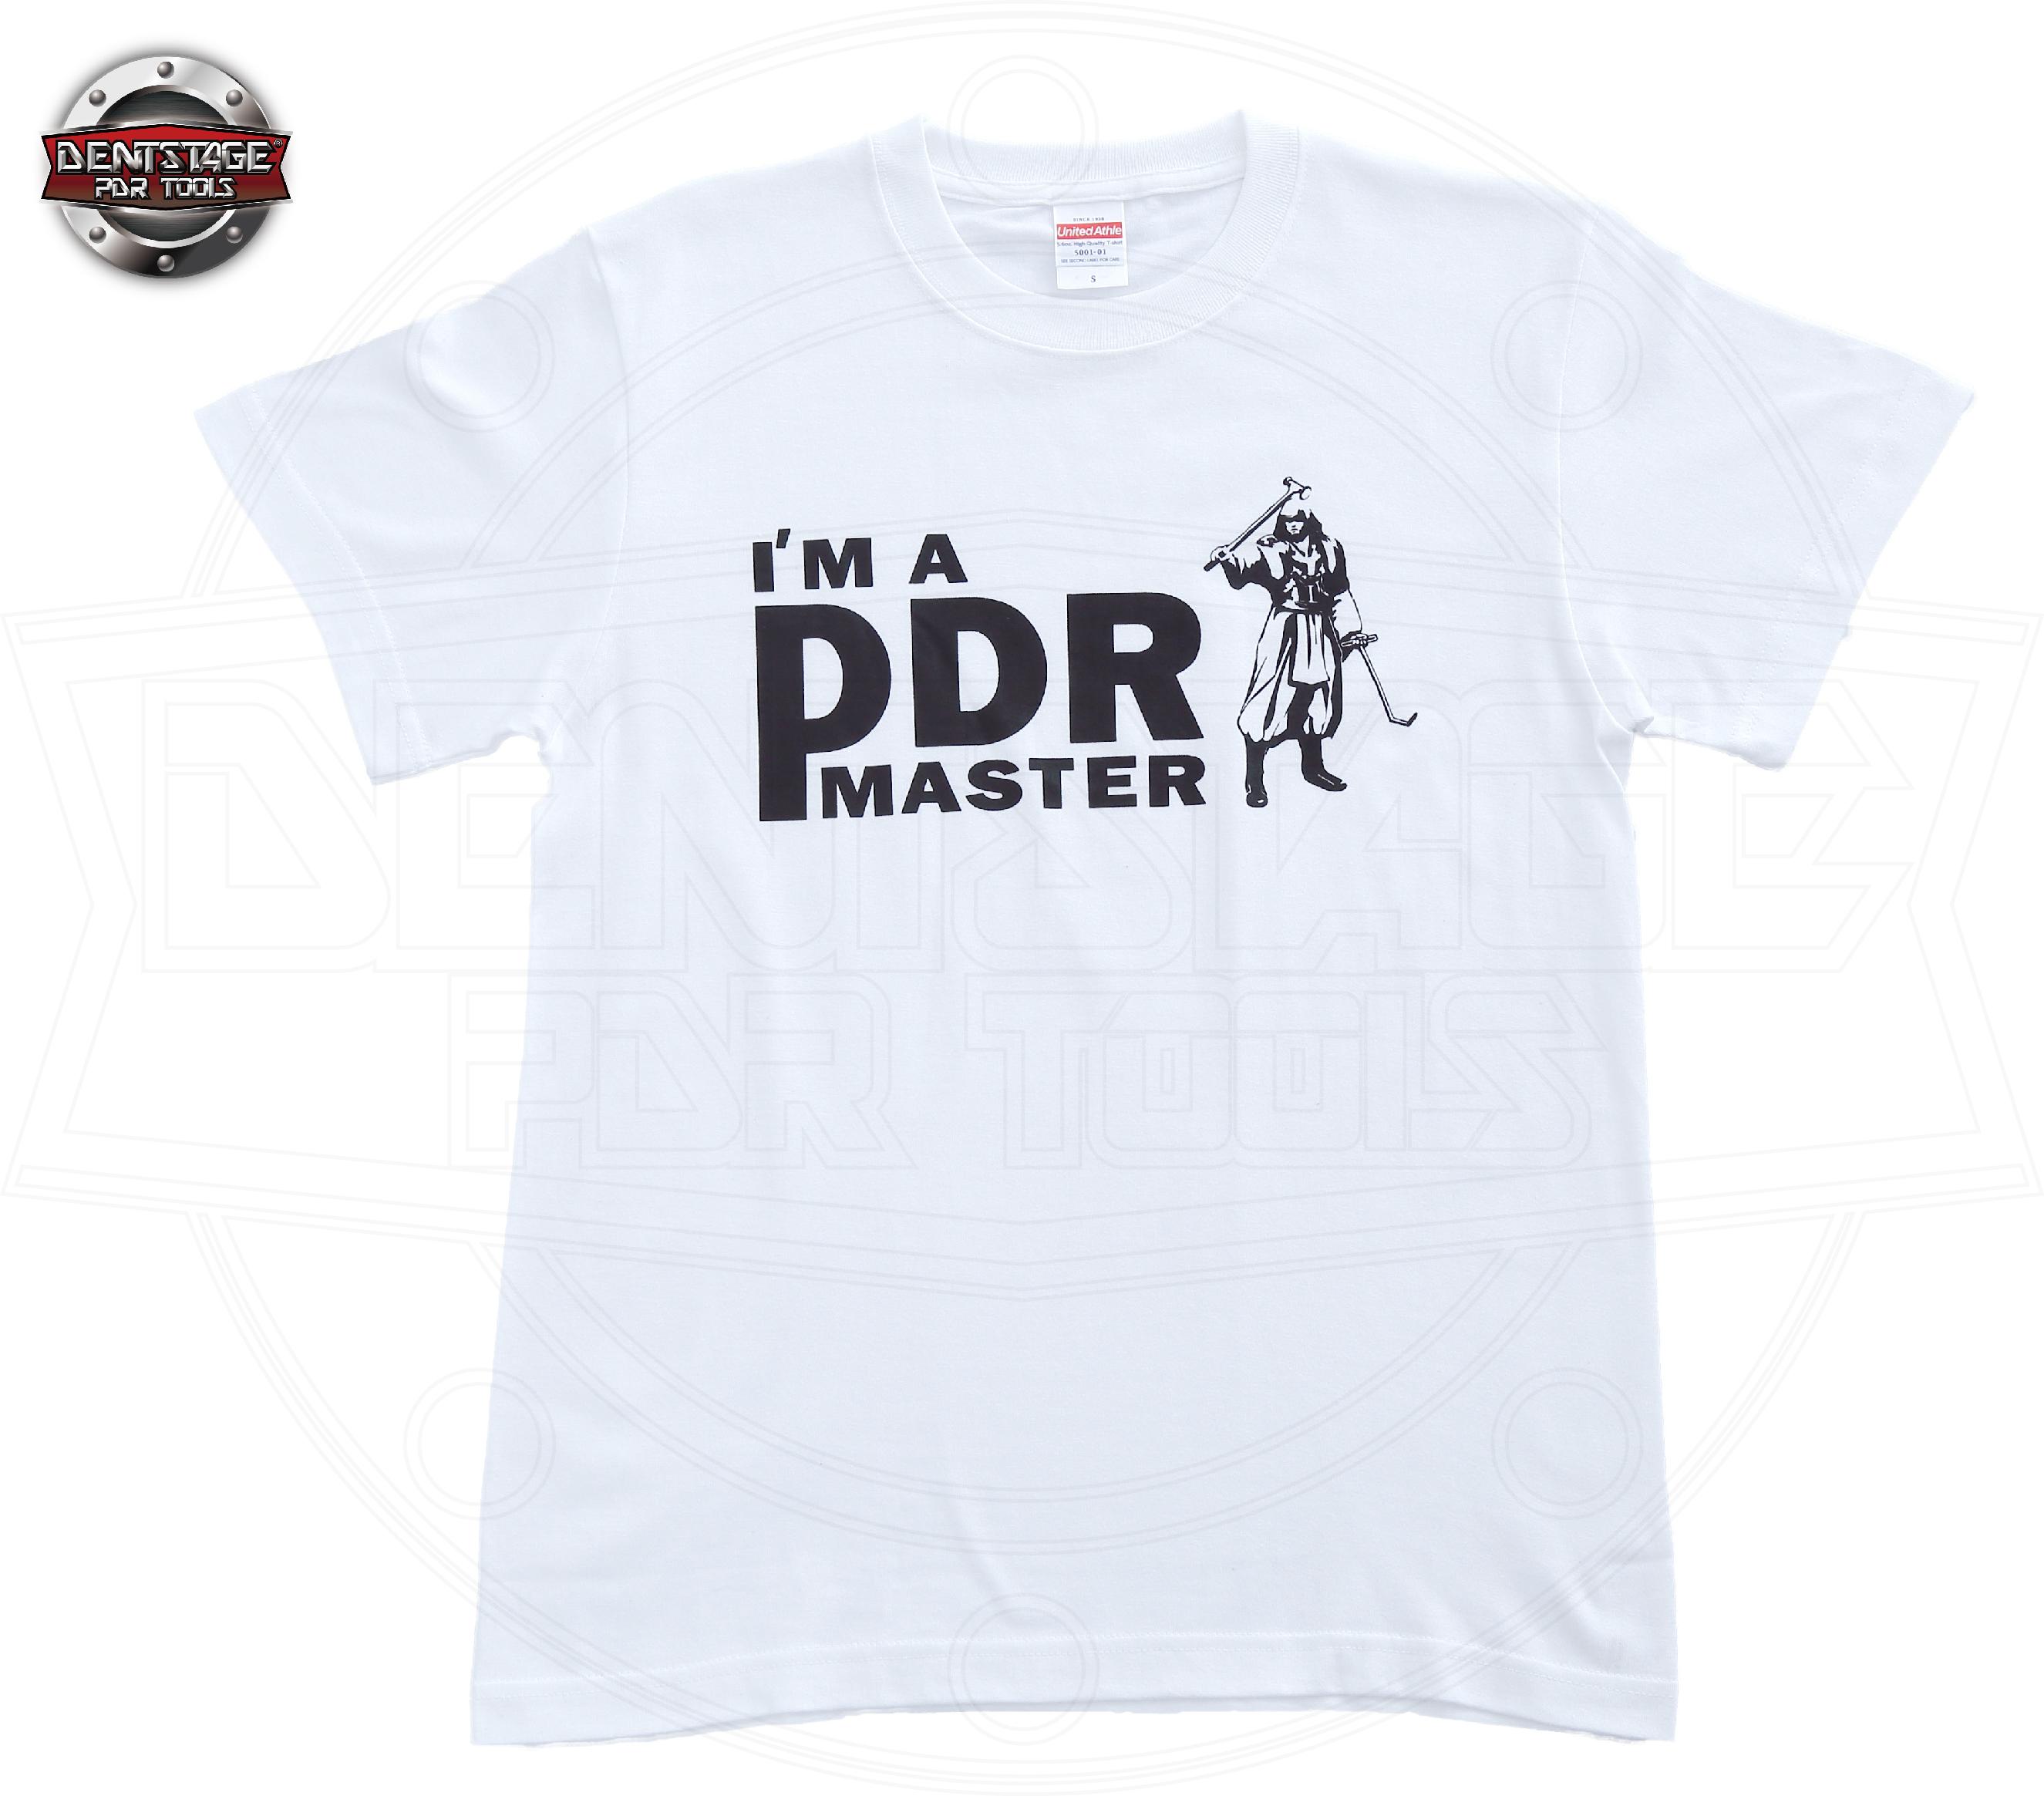 PDR Jedi Master 紀念T恤(白)-01.jpg